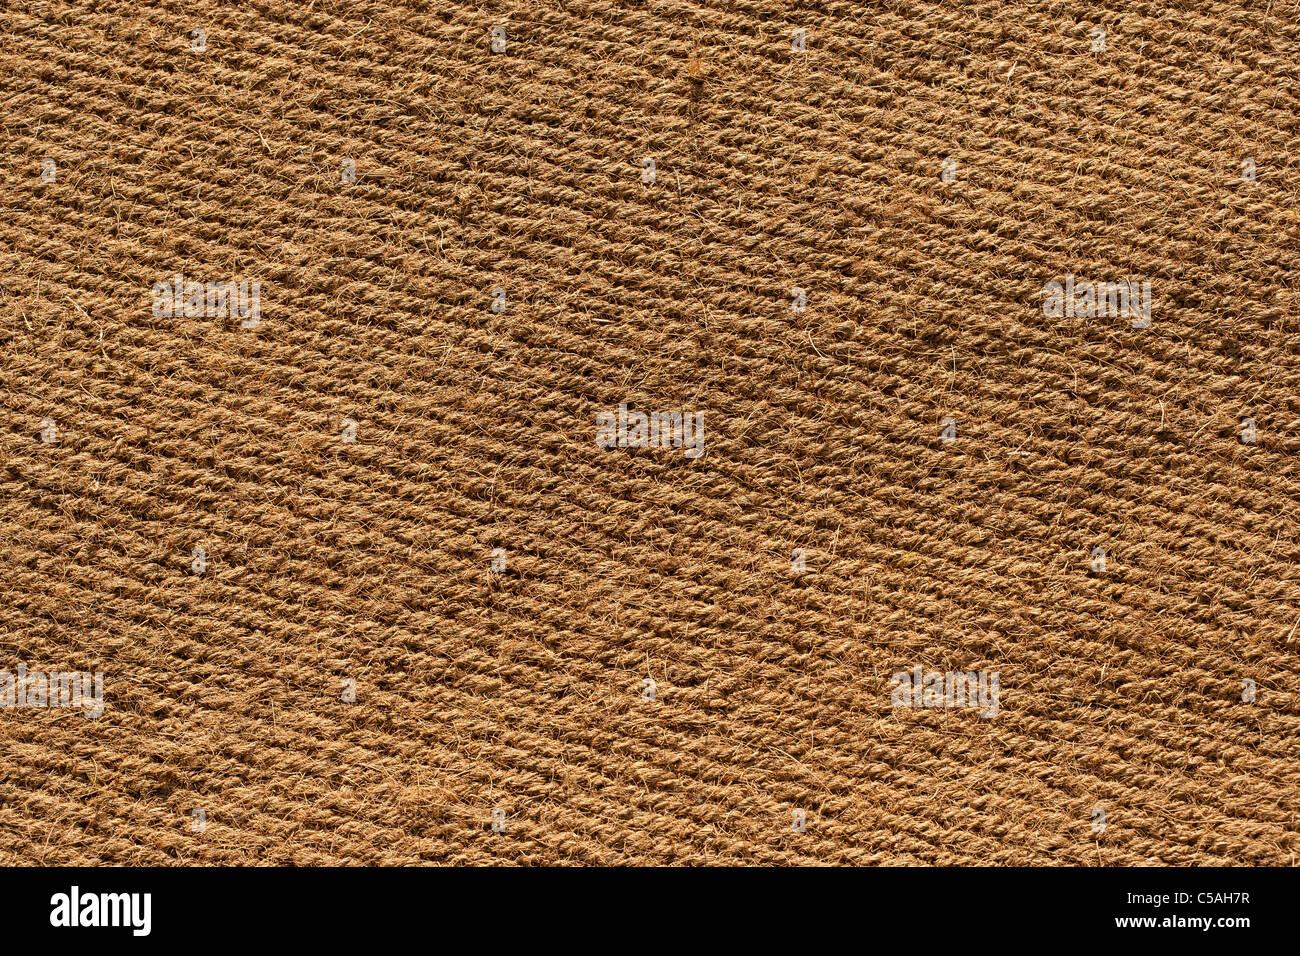 mat products natural p entrance matting width coir